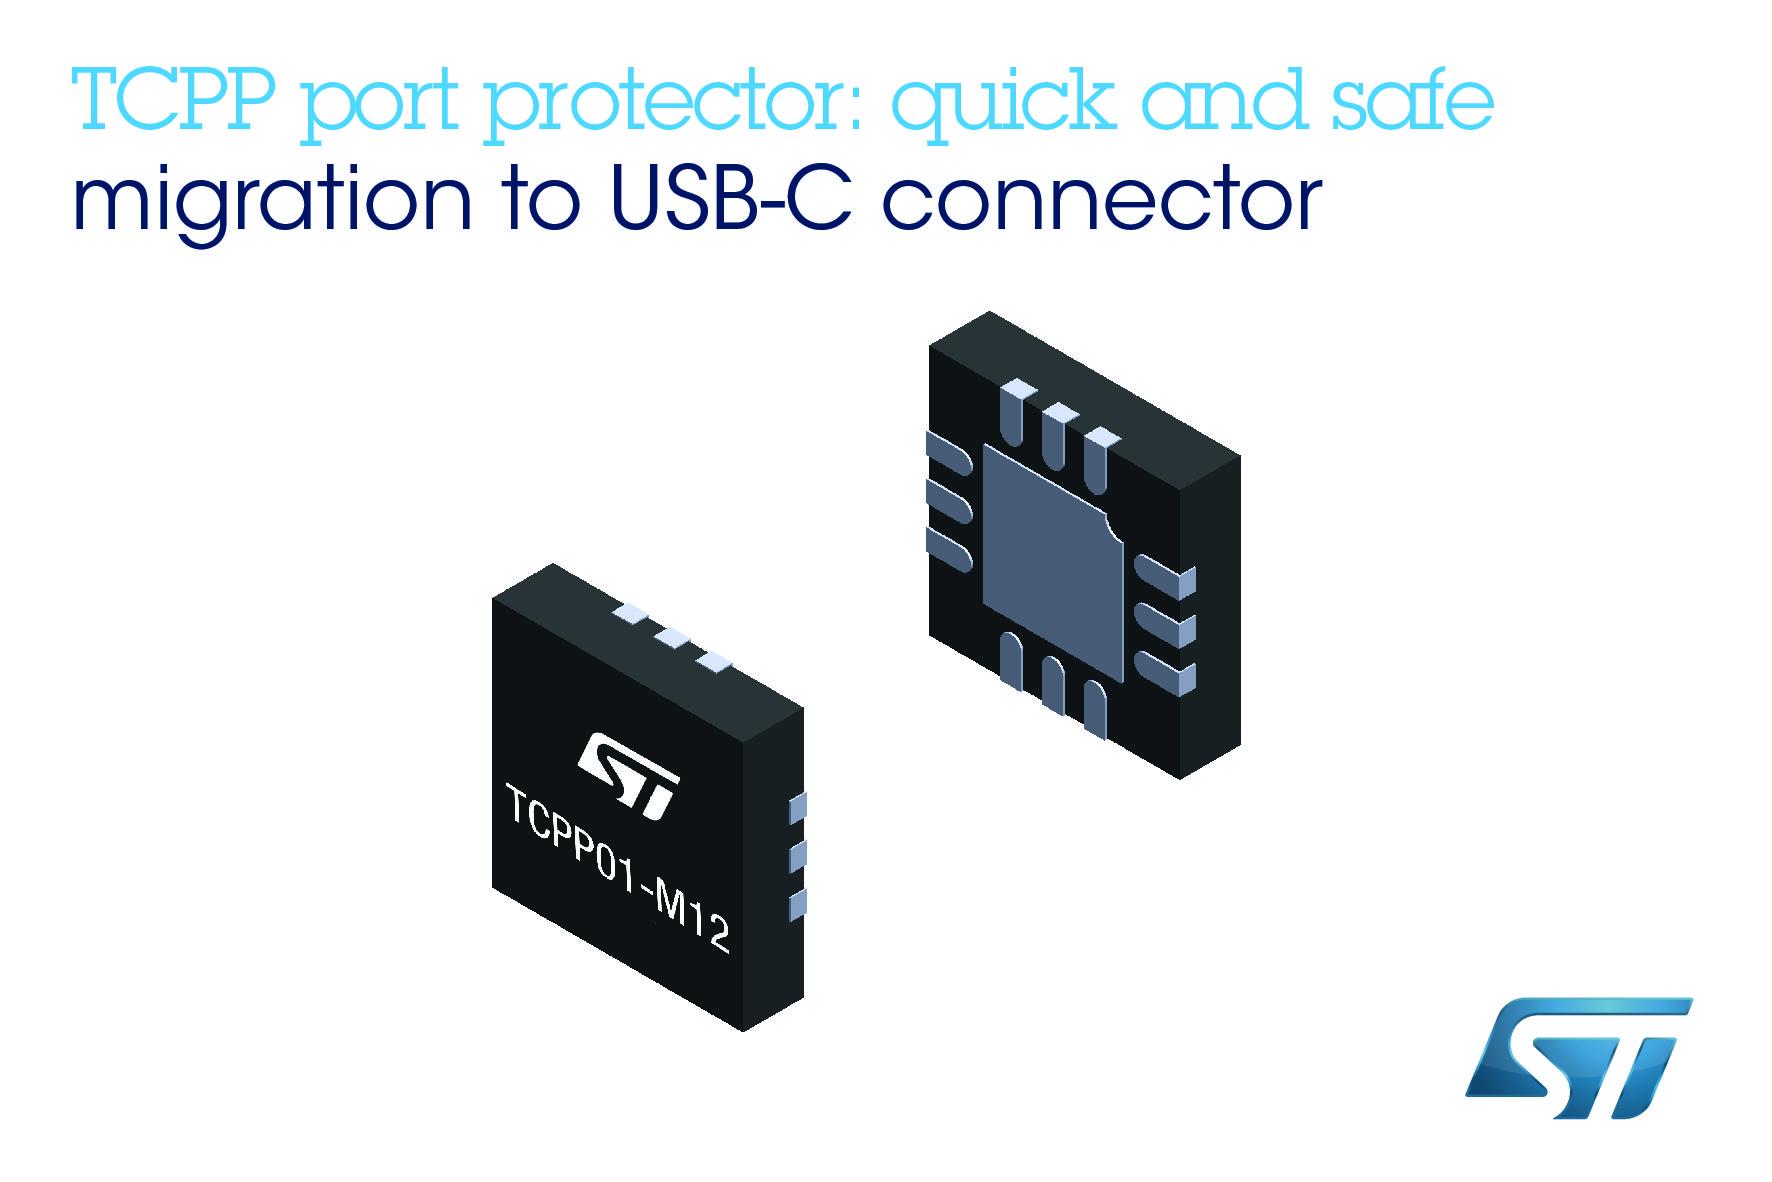 ST新闻稿2019年11月6日——意法半导体USB Type-C端口保护IC全面防护,简化大众市场设备数据线升级过程.jpg